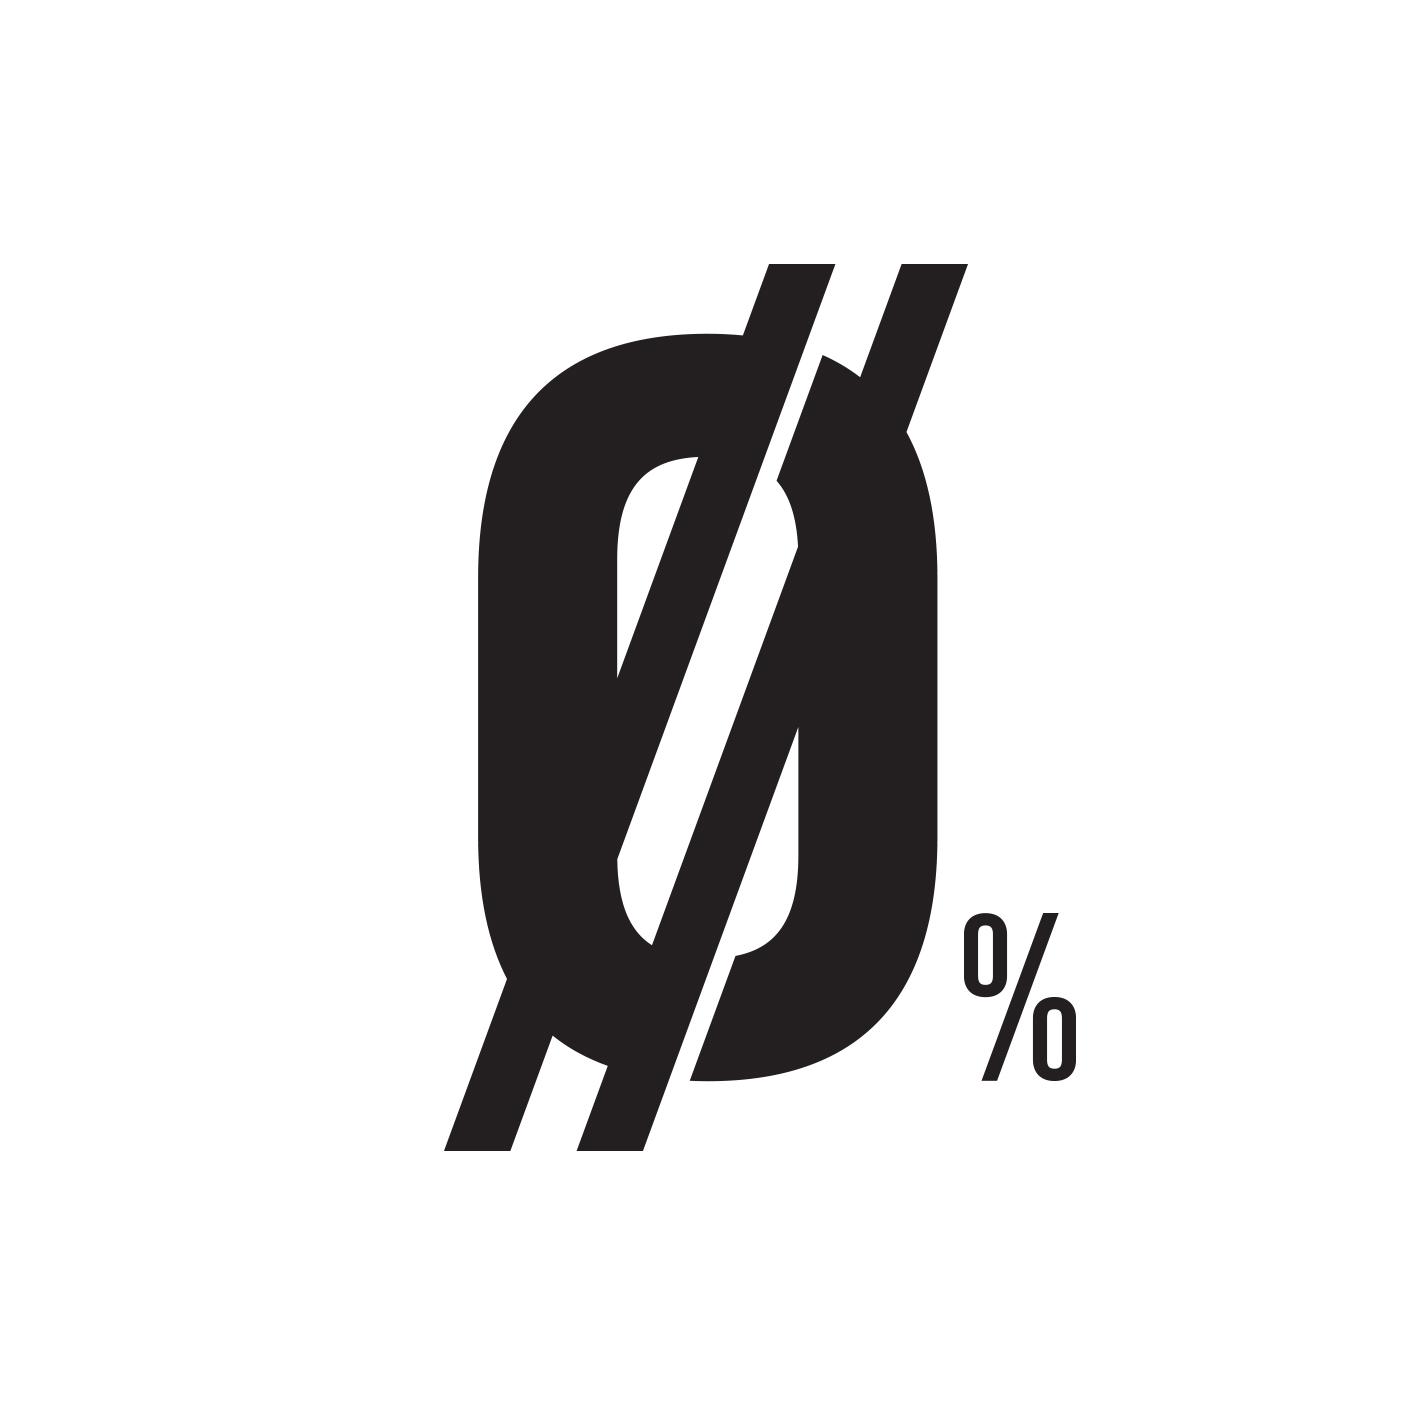 Owenshire Zero Percent Album Cover Robert Muhlbock